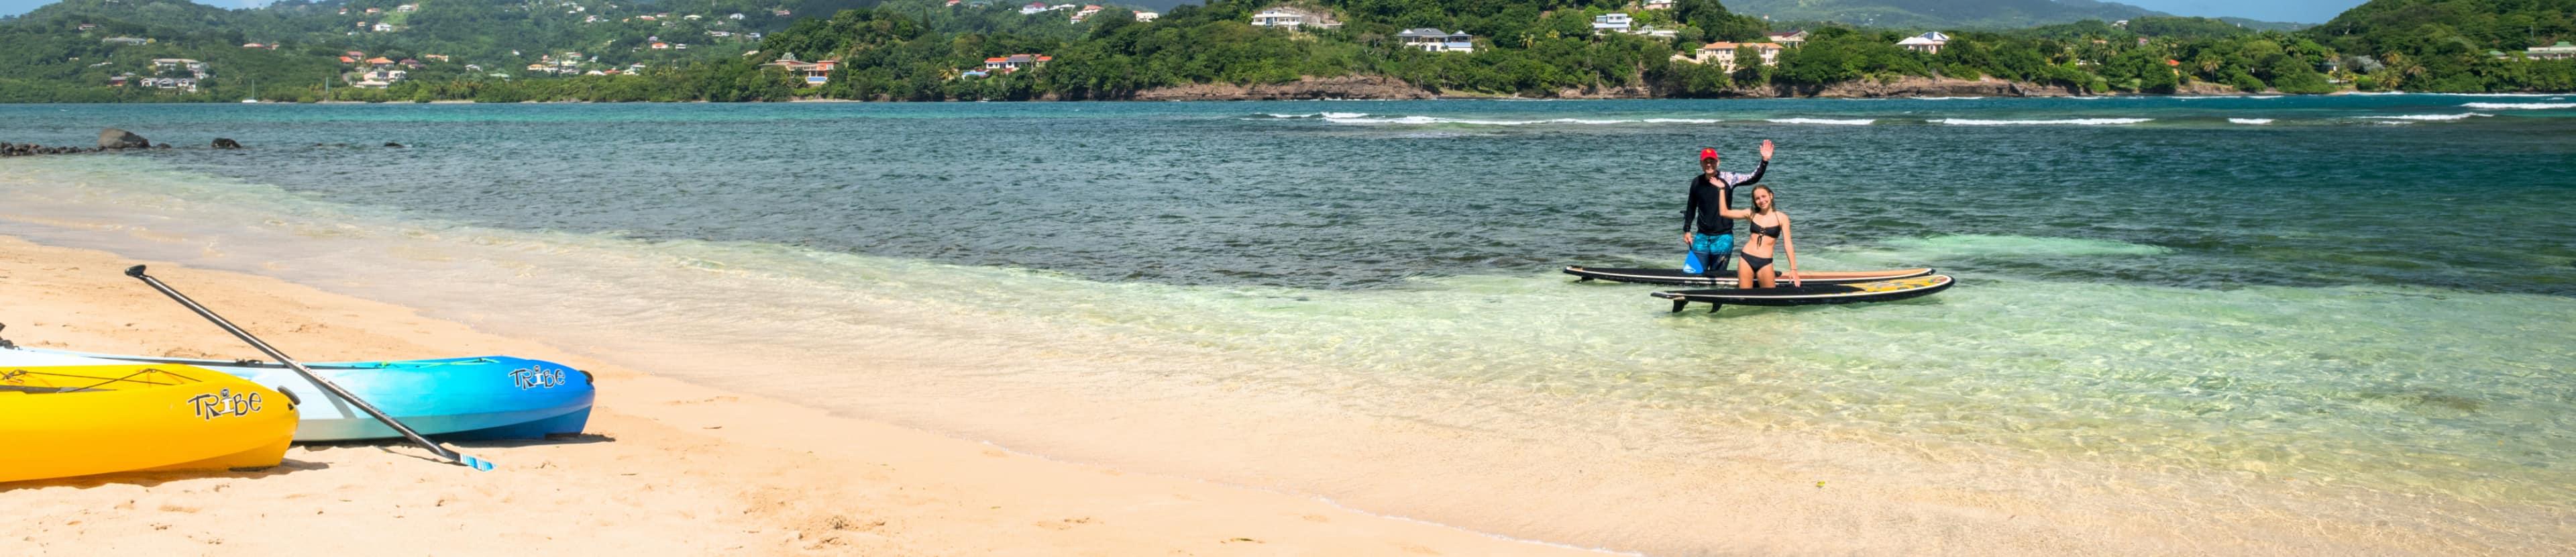 Beach resort in Grenada